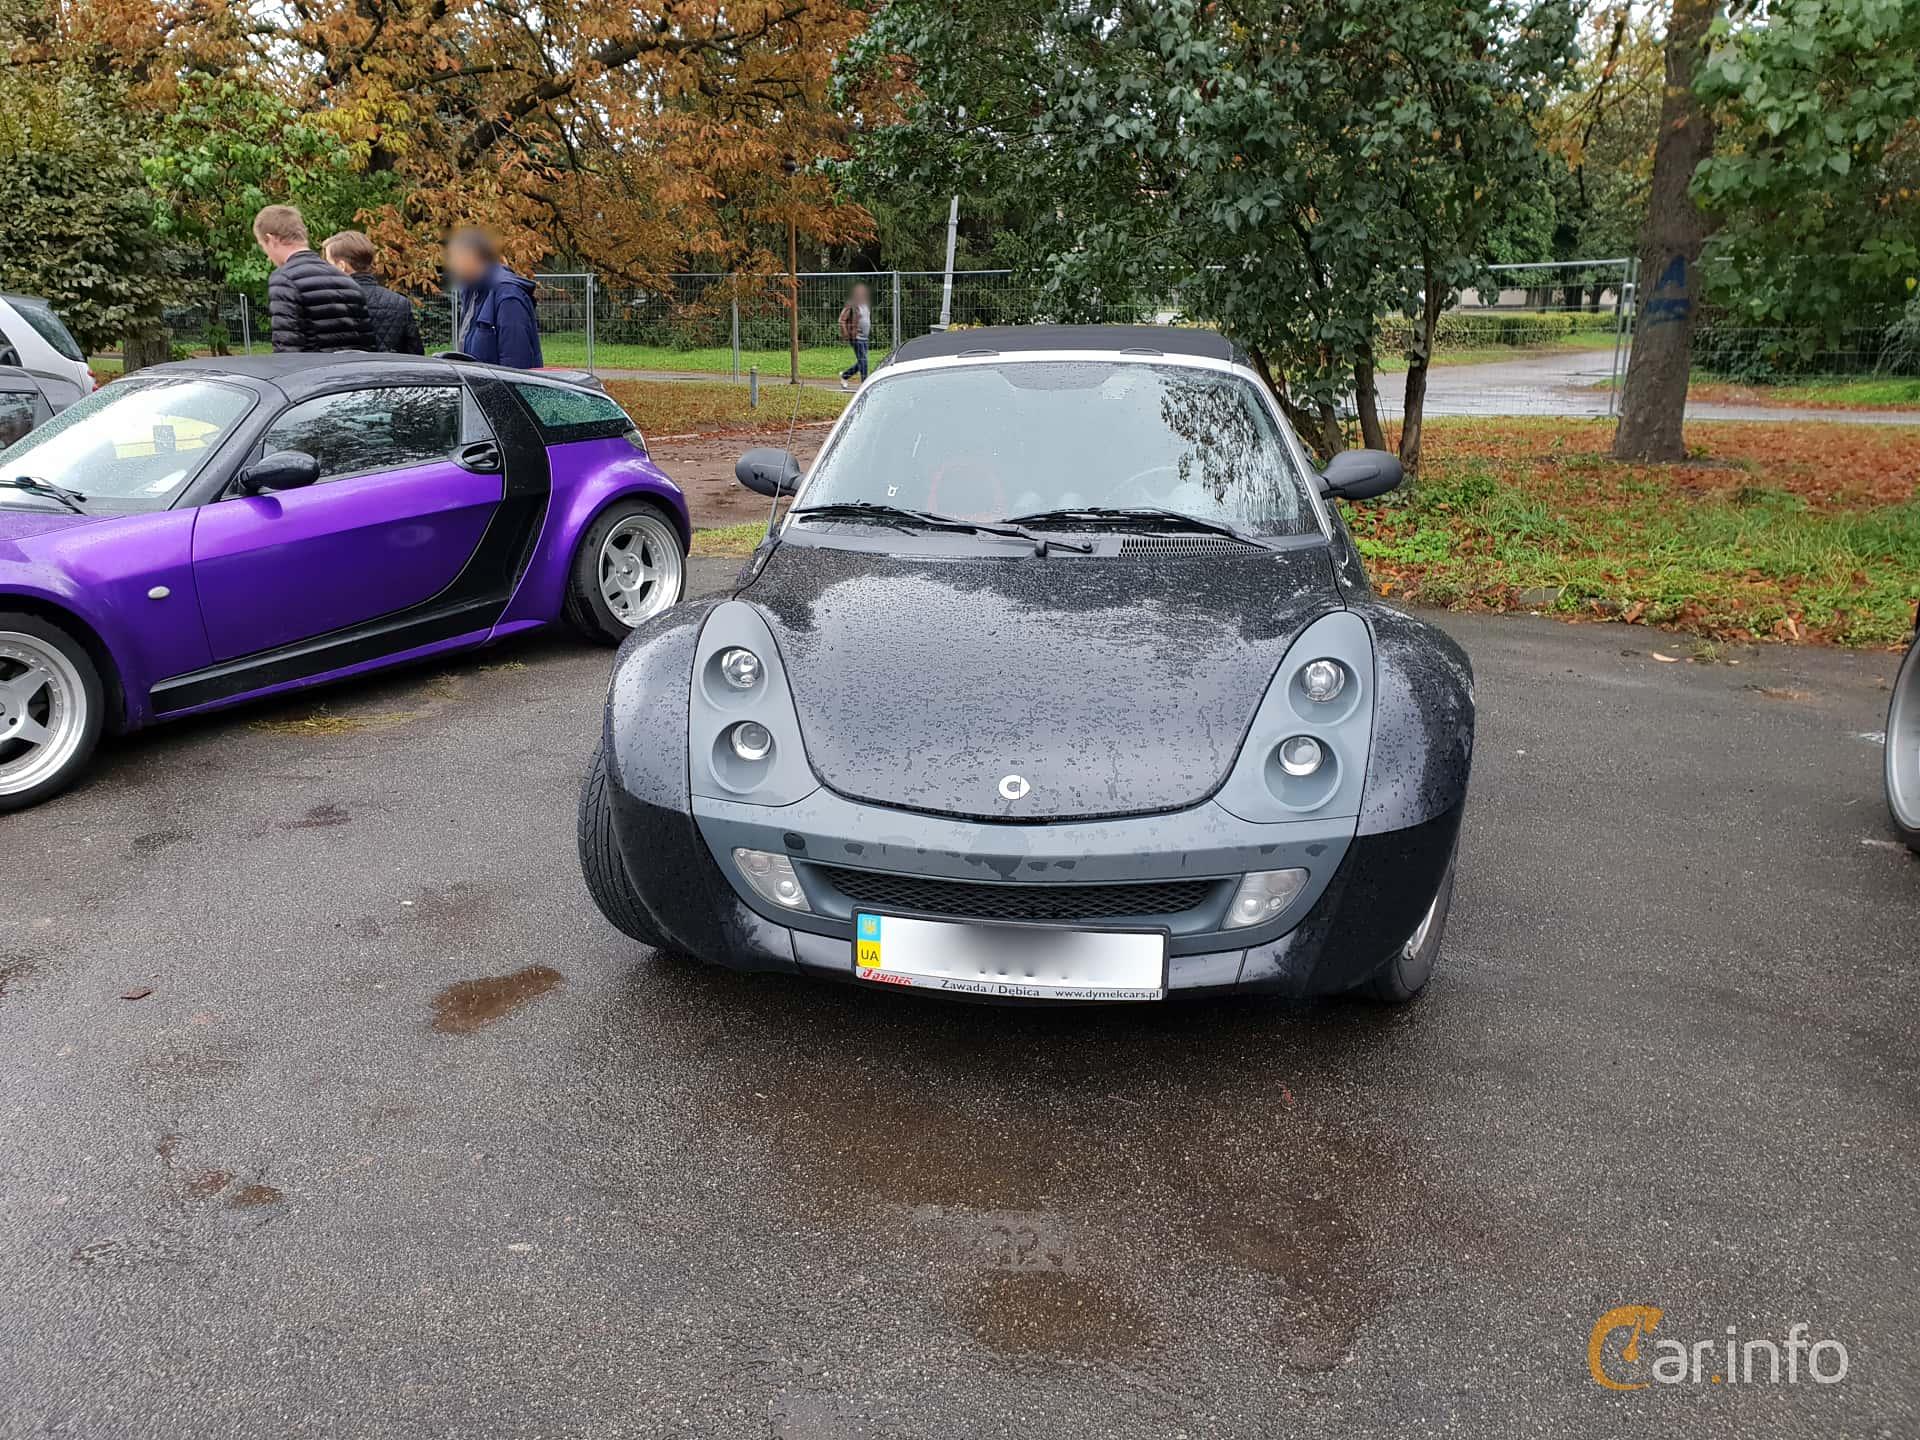 Cars 1920x1440